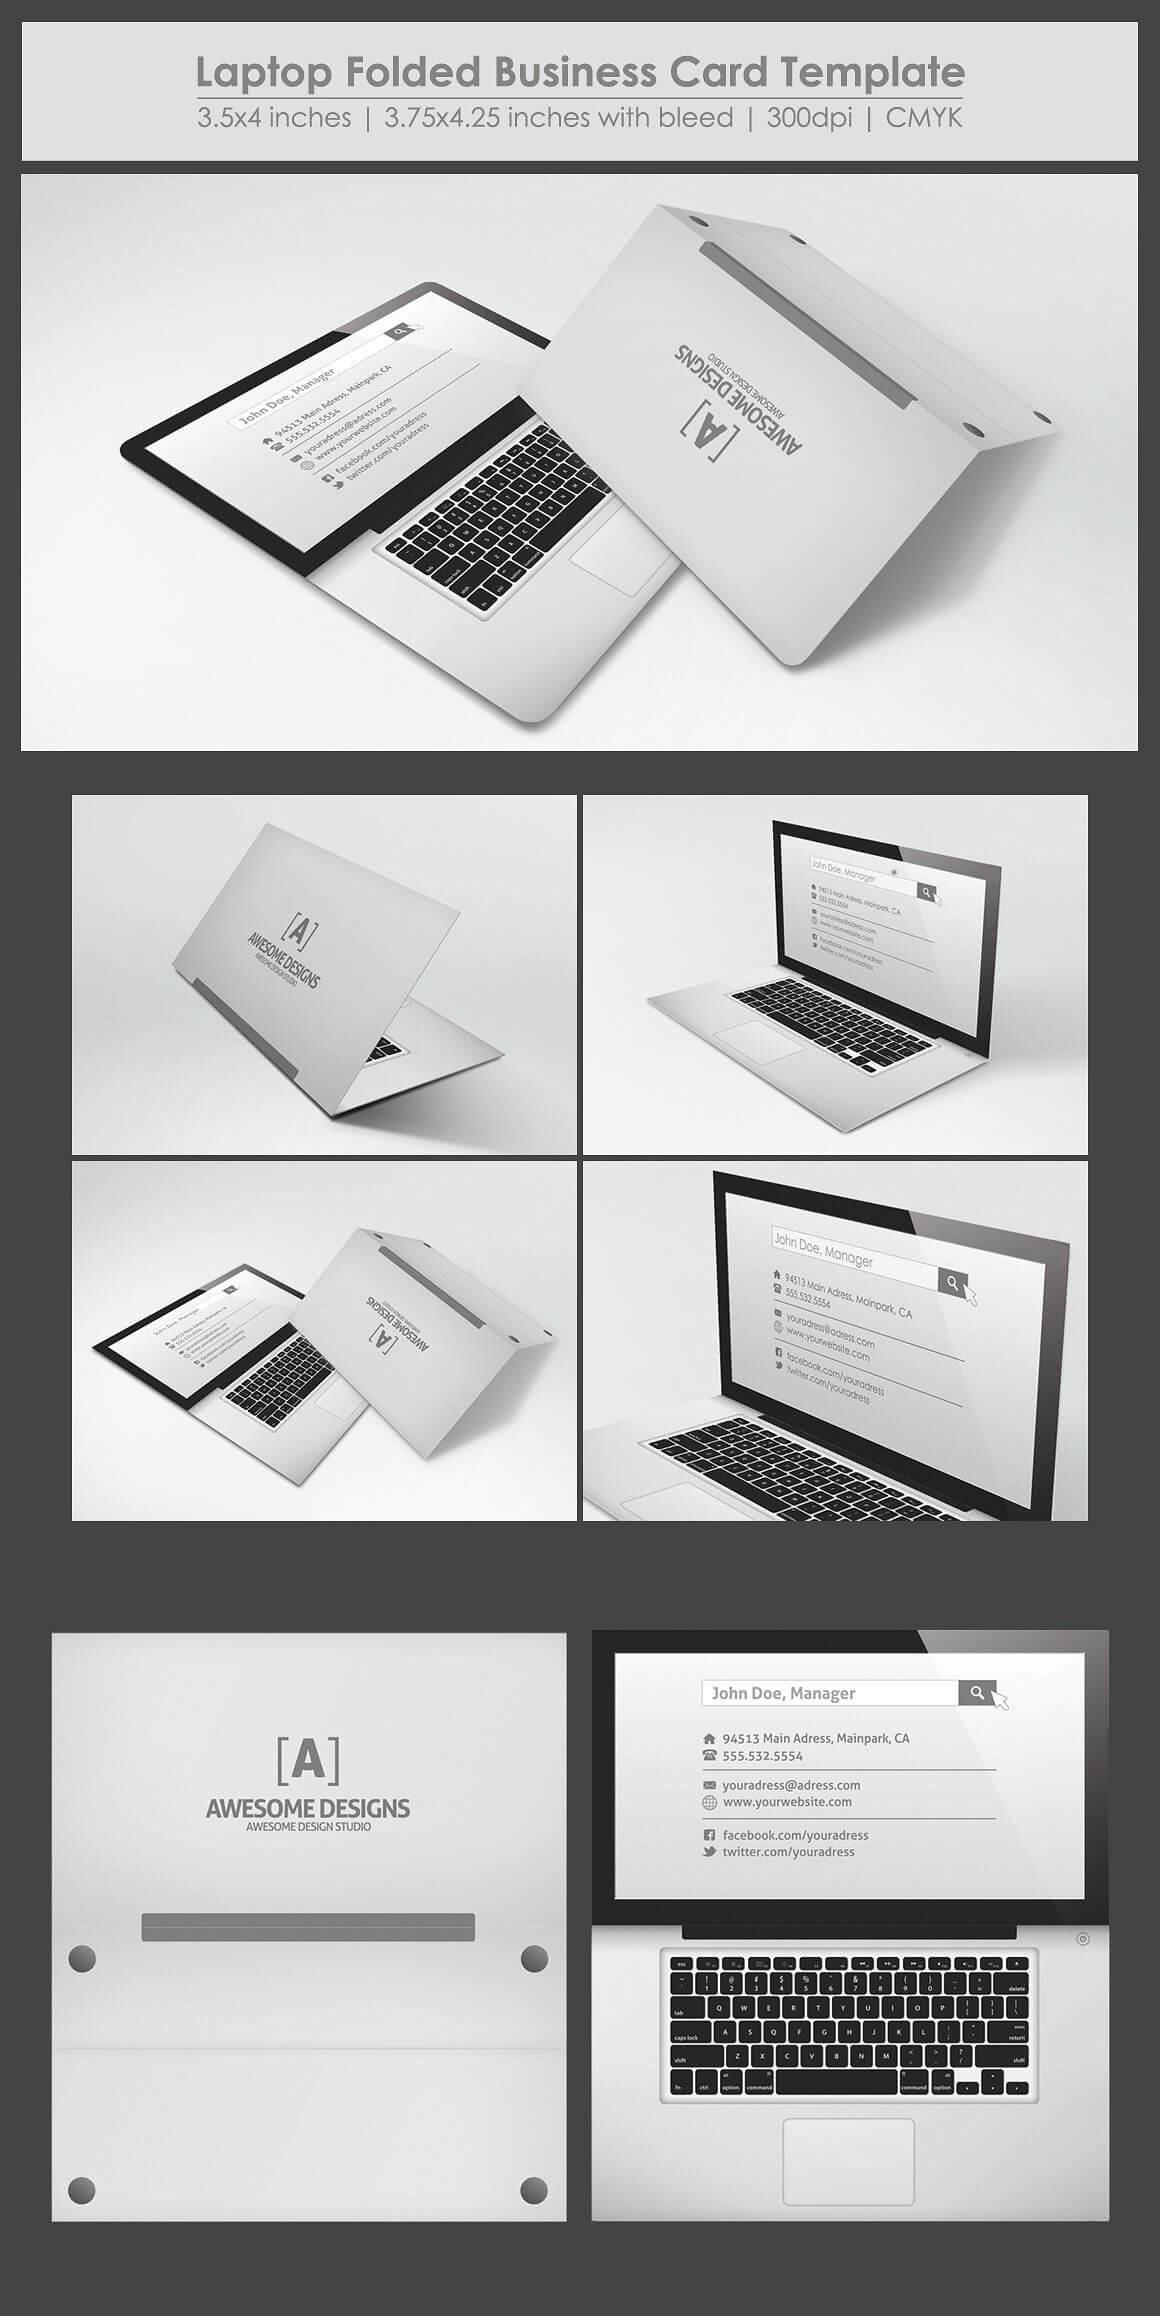 012 Folded Business Card Templates Template Ideas Unusual With Fold Over Business Card Template